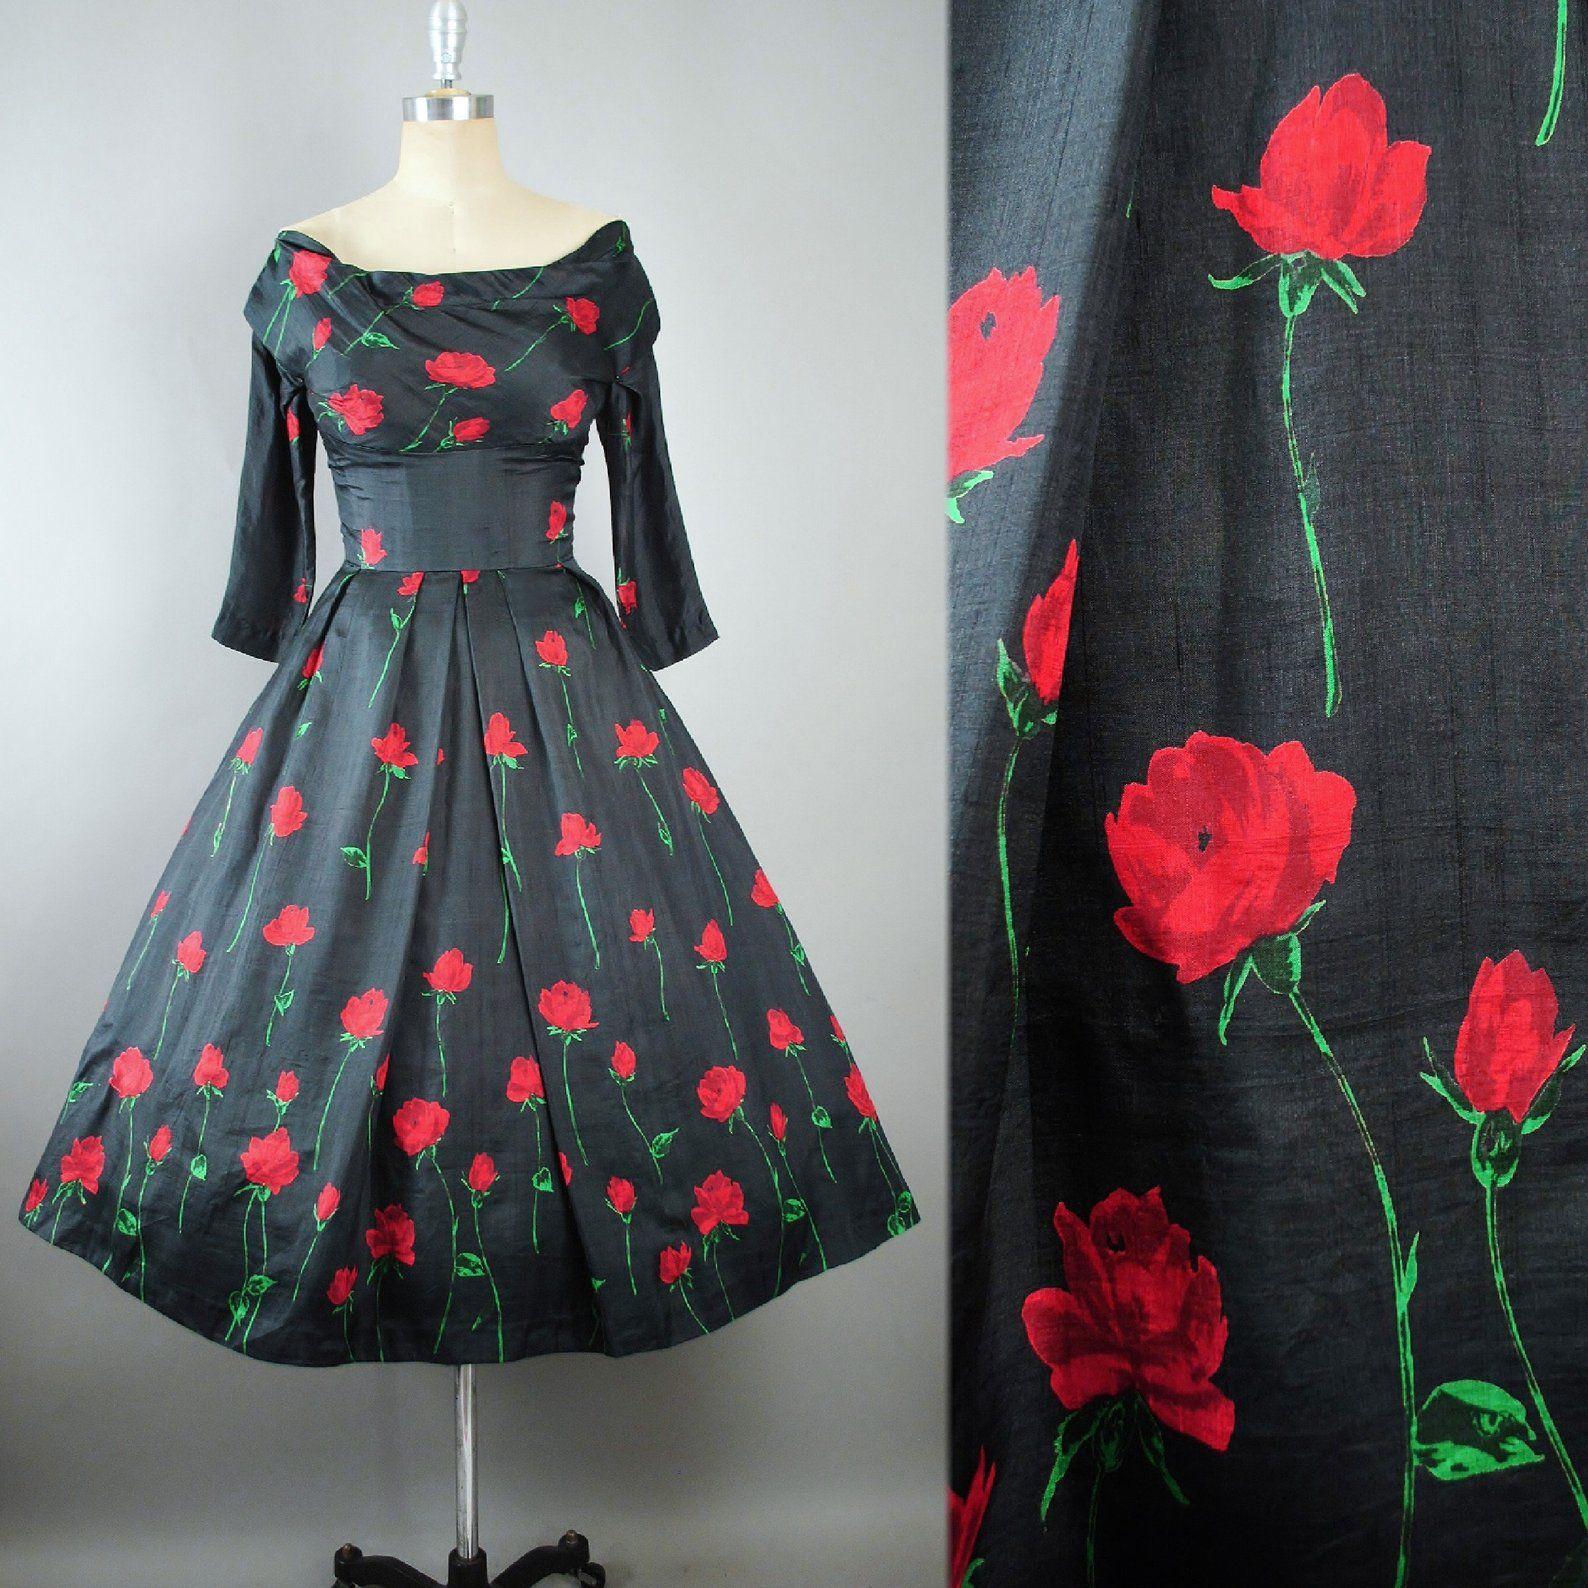 New Look Womens Floral Long Sleeve Midi Tea Summer Casual Vintage Dress Swing UK